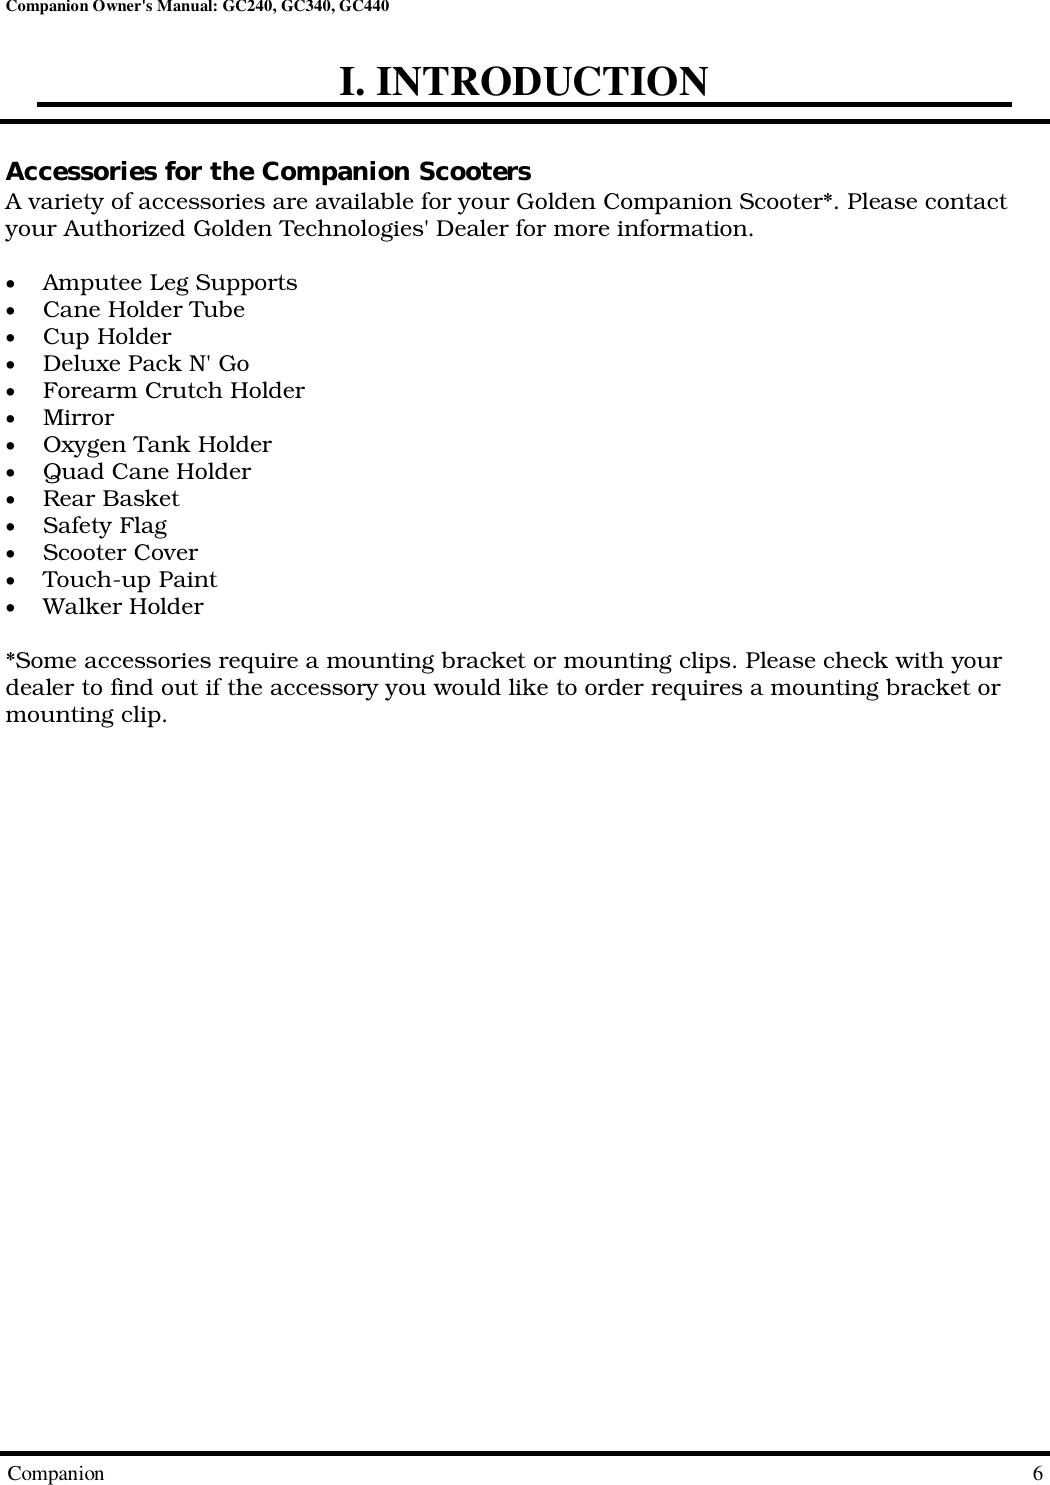 Golden Technologies Gc240 Users Manual CompanionOwnersManual